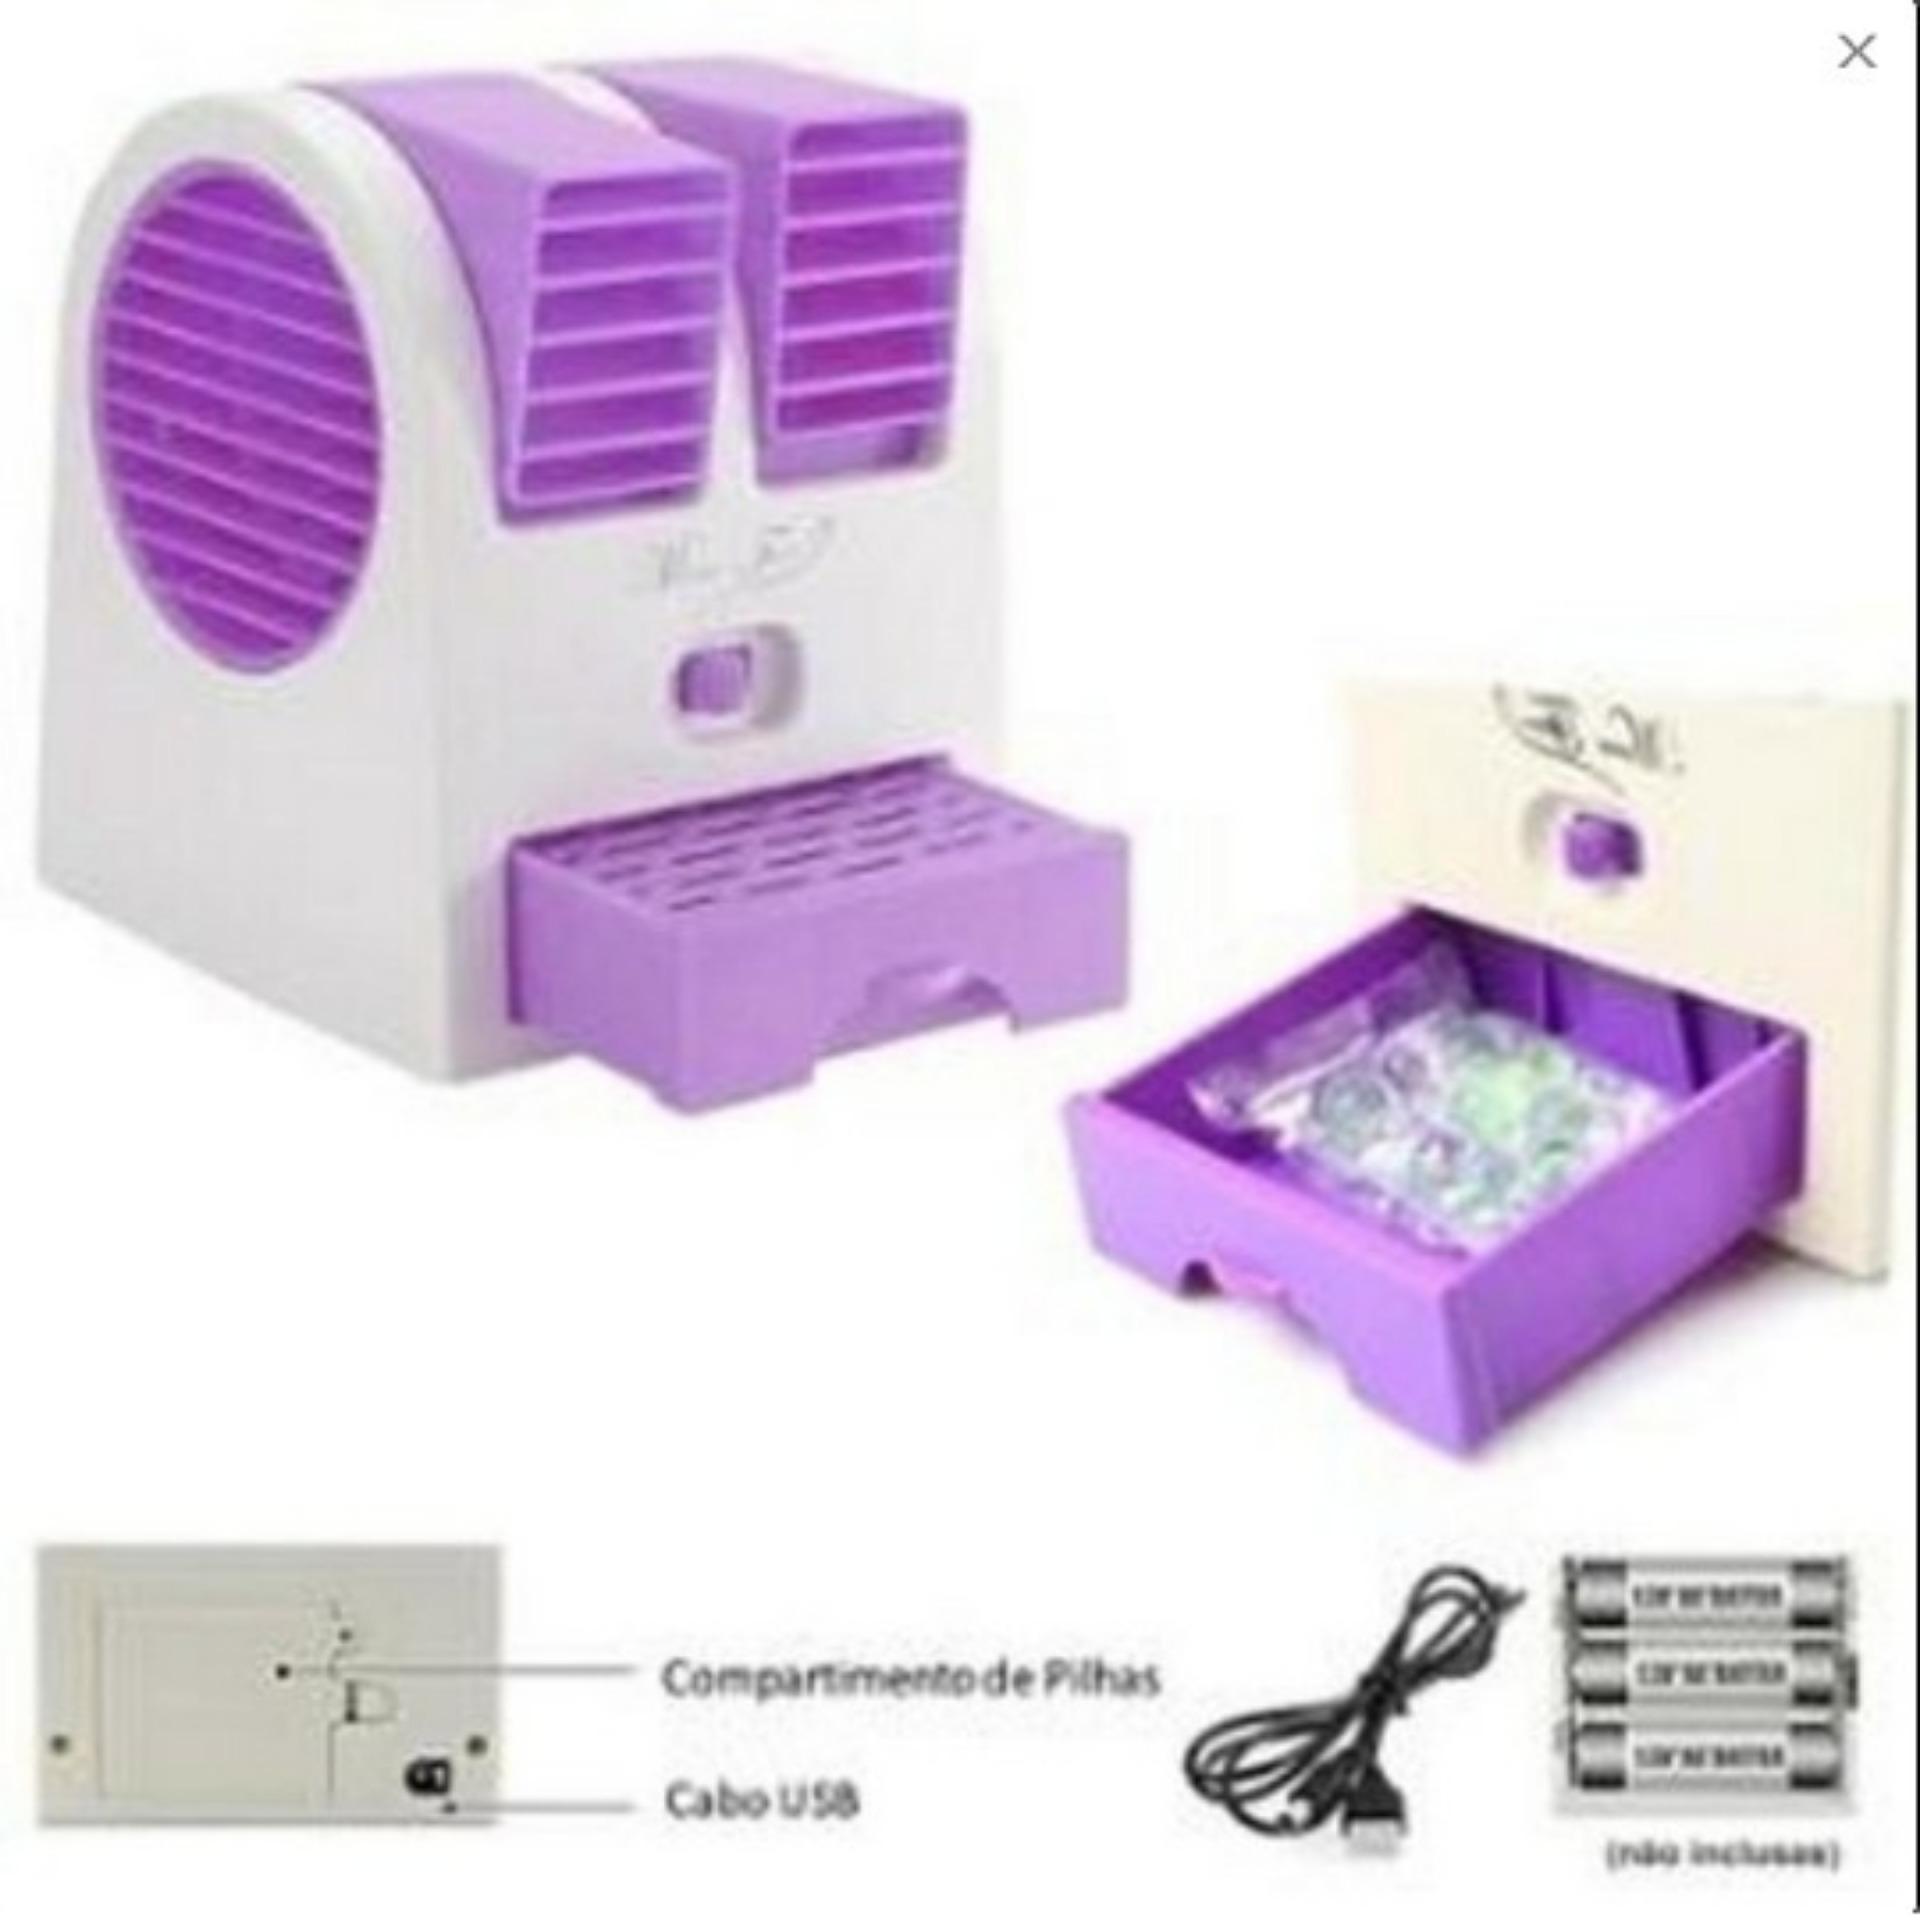 Penawaran Bagus Promoac Duduk Double Mini Fan Portable Blower Kipas Angin Ac Twin Parfum Usb